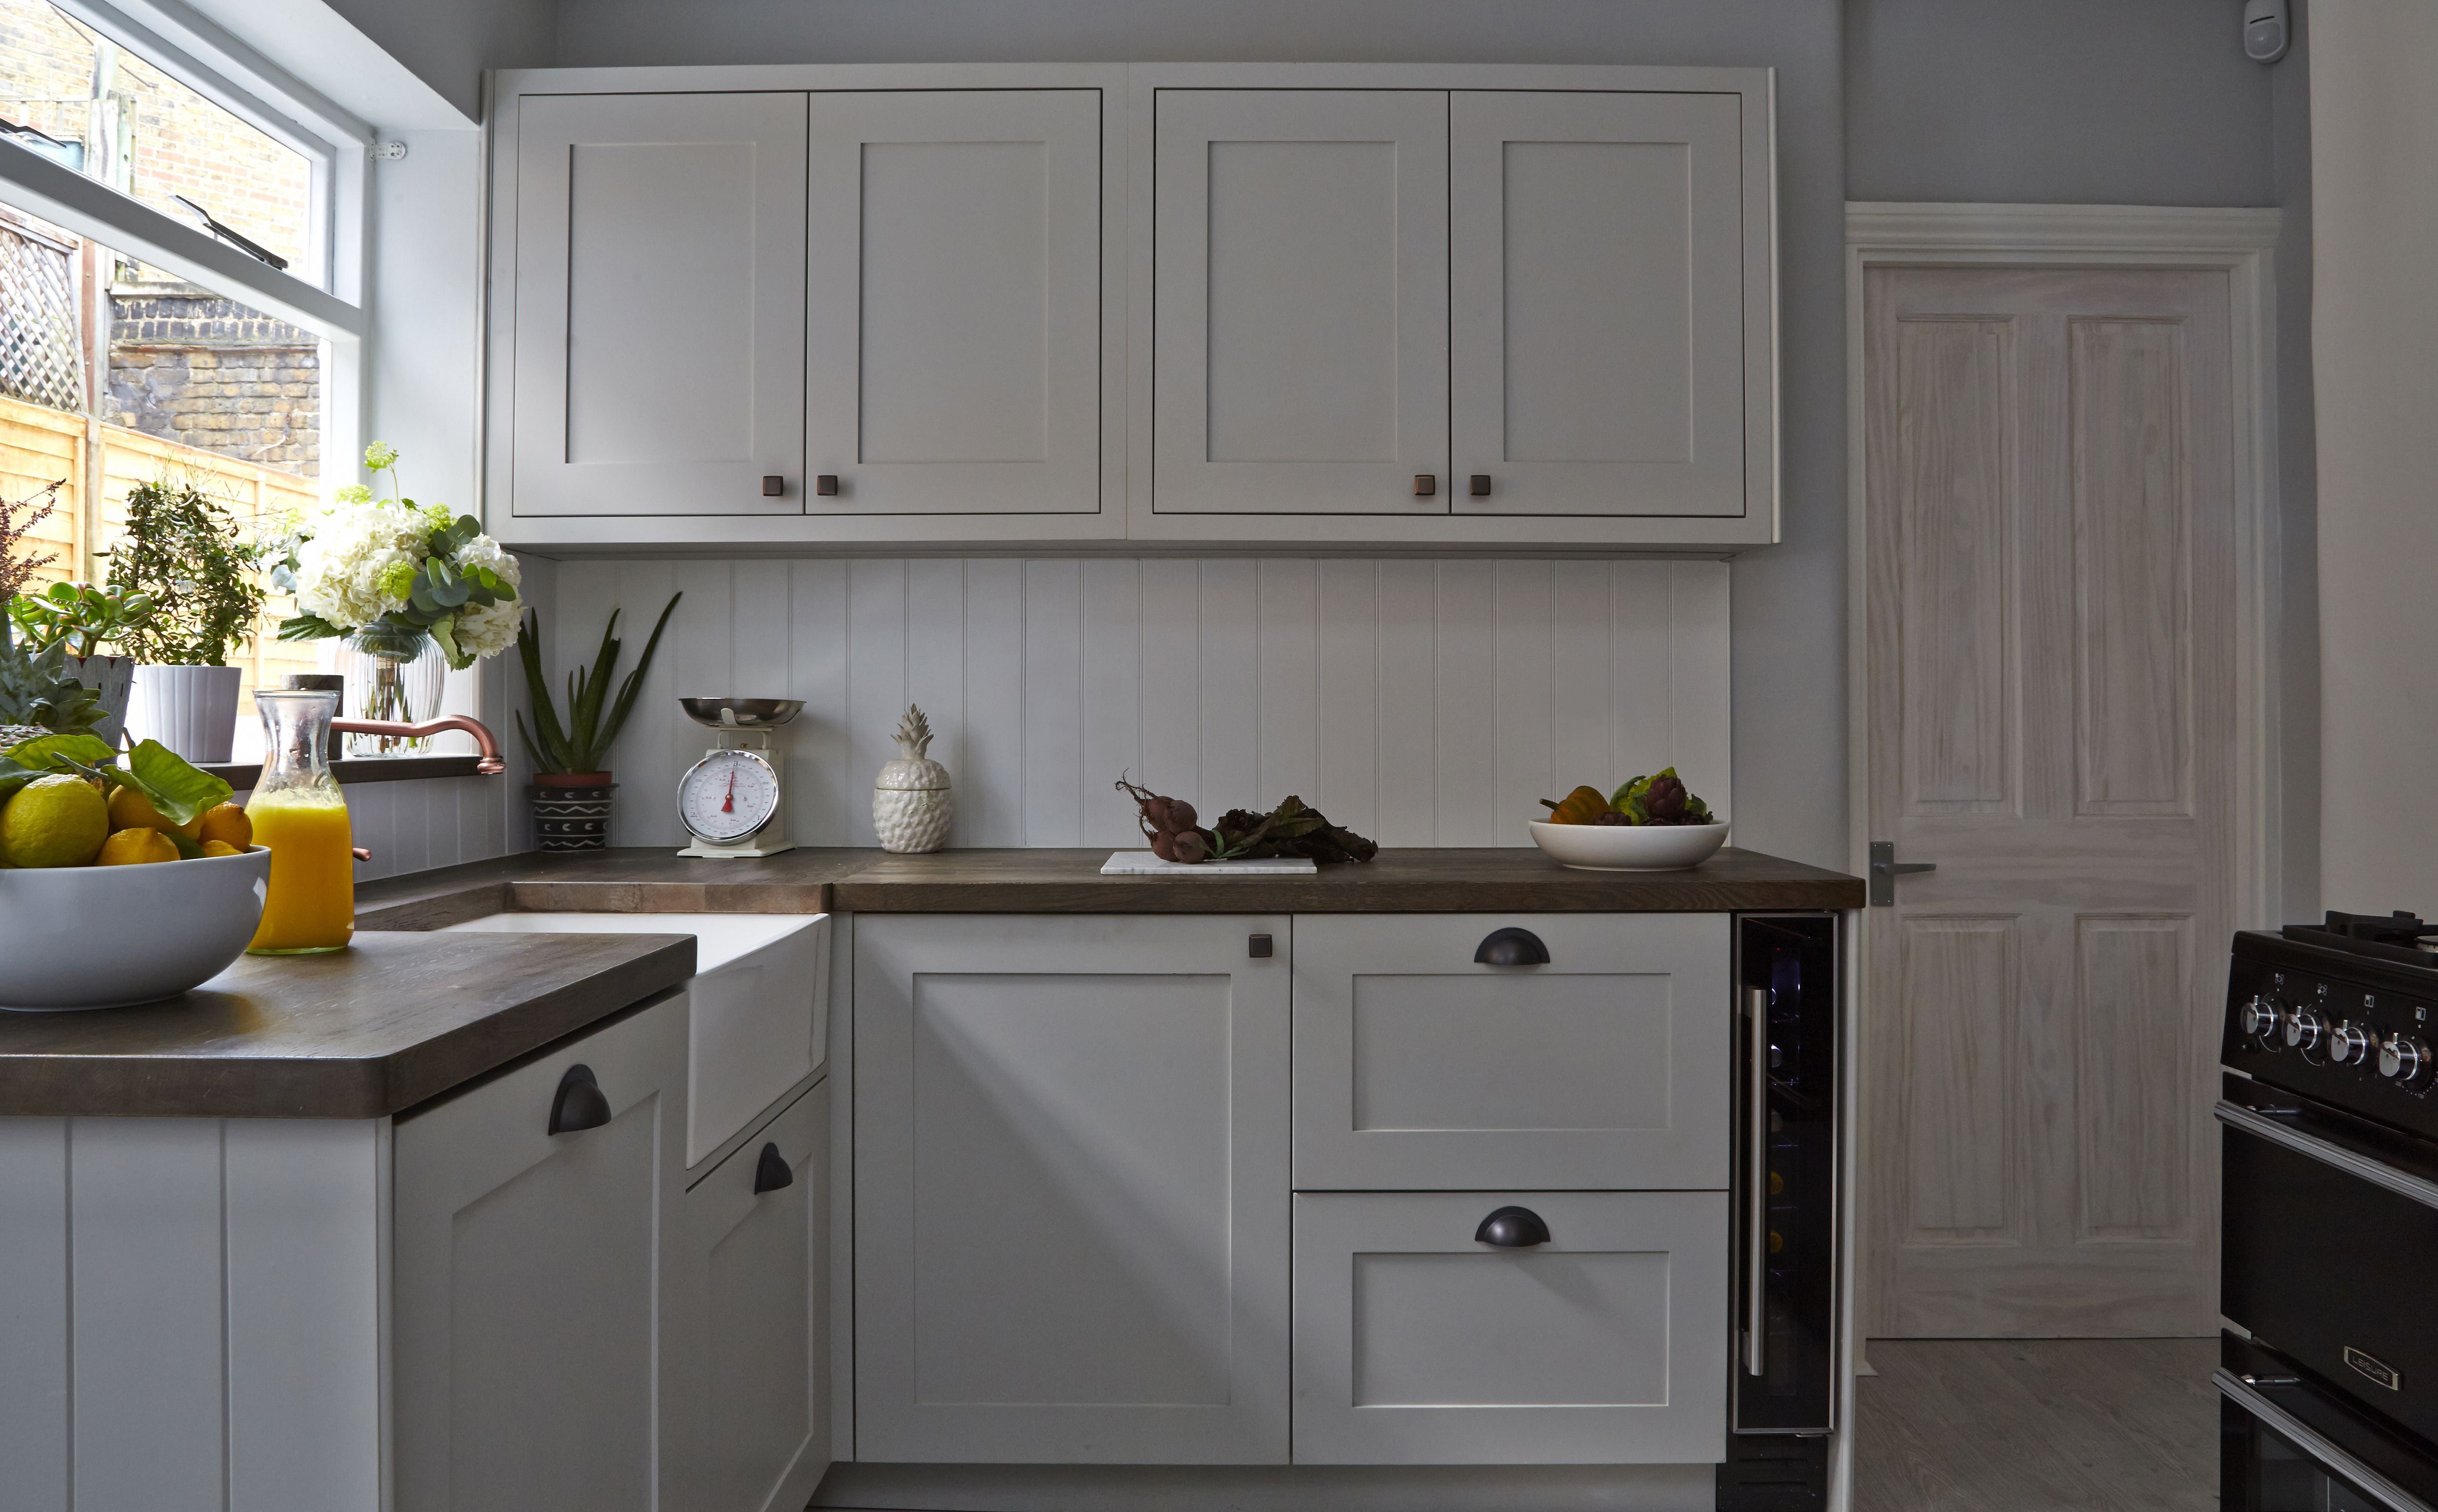 Battersea Townhouse, Bespoke Kitchen, Copper Tap, White Kitchen, White  Sink, Wooden